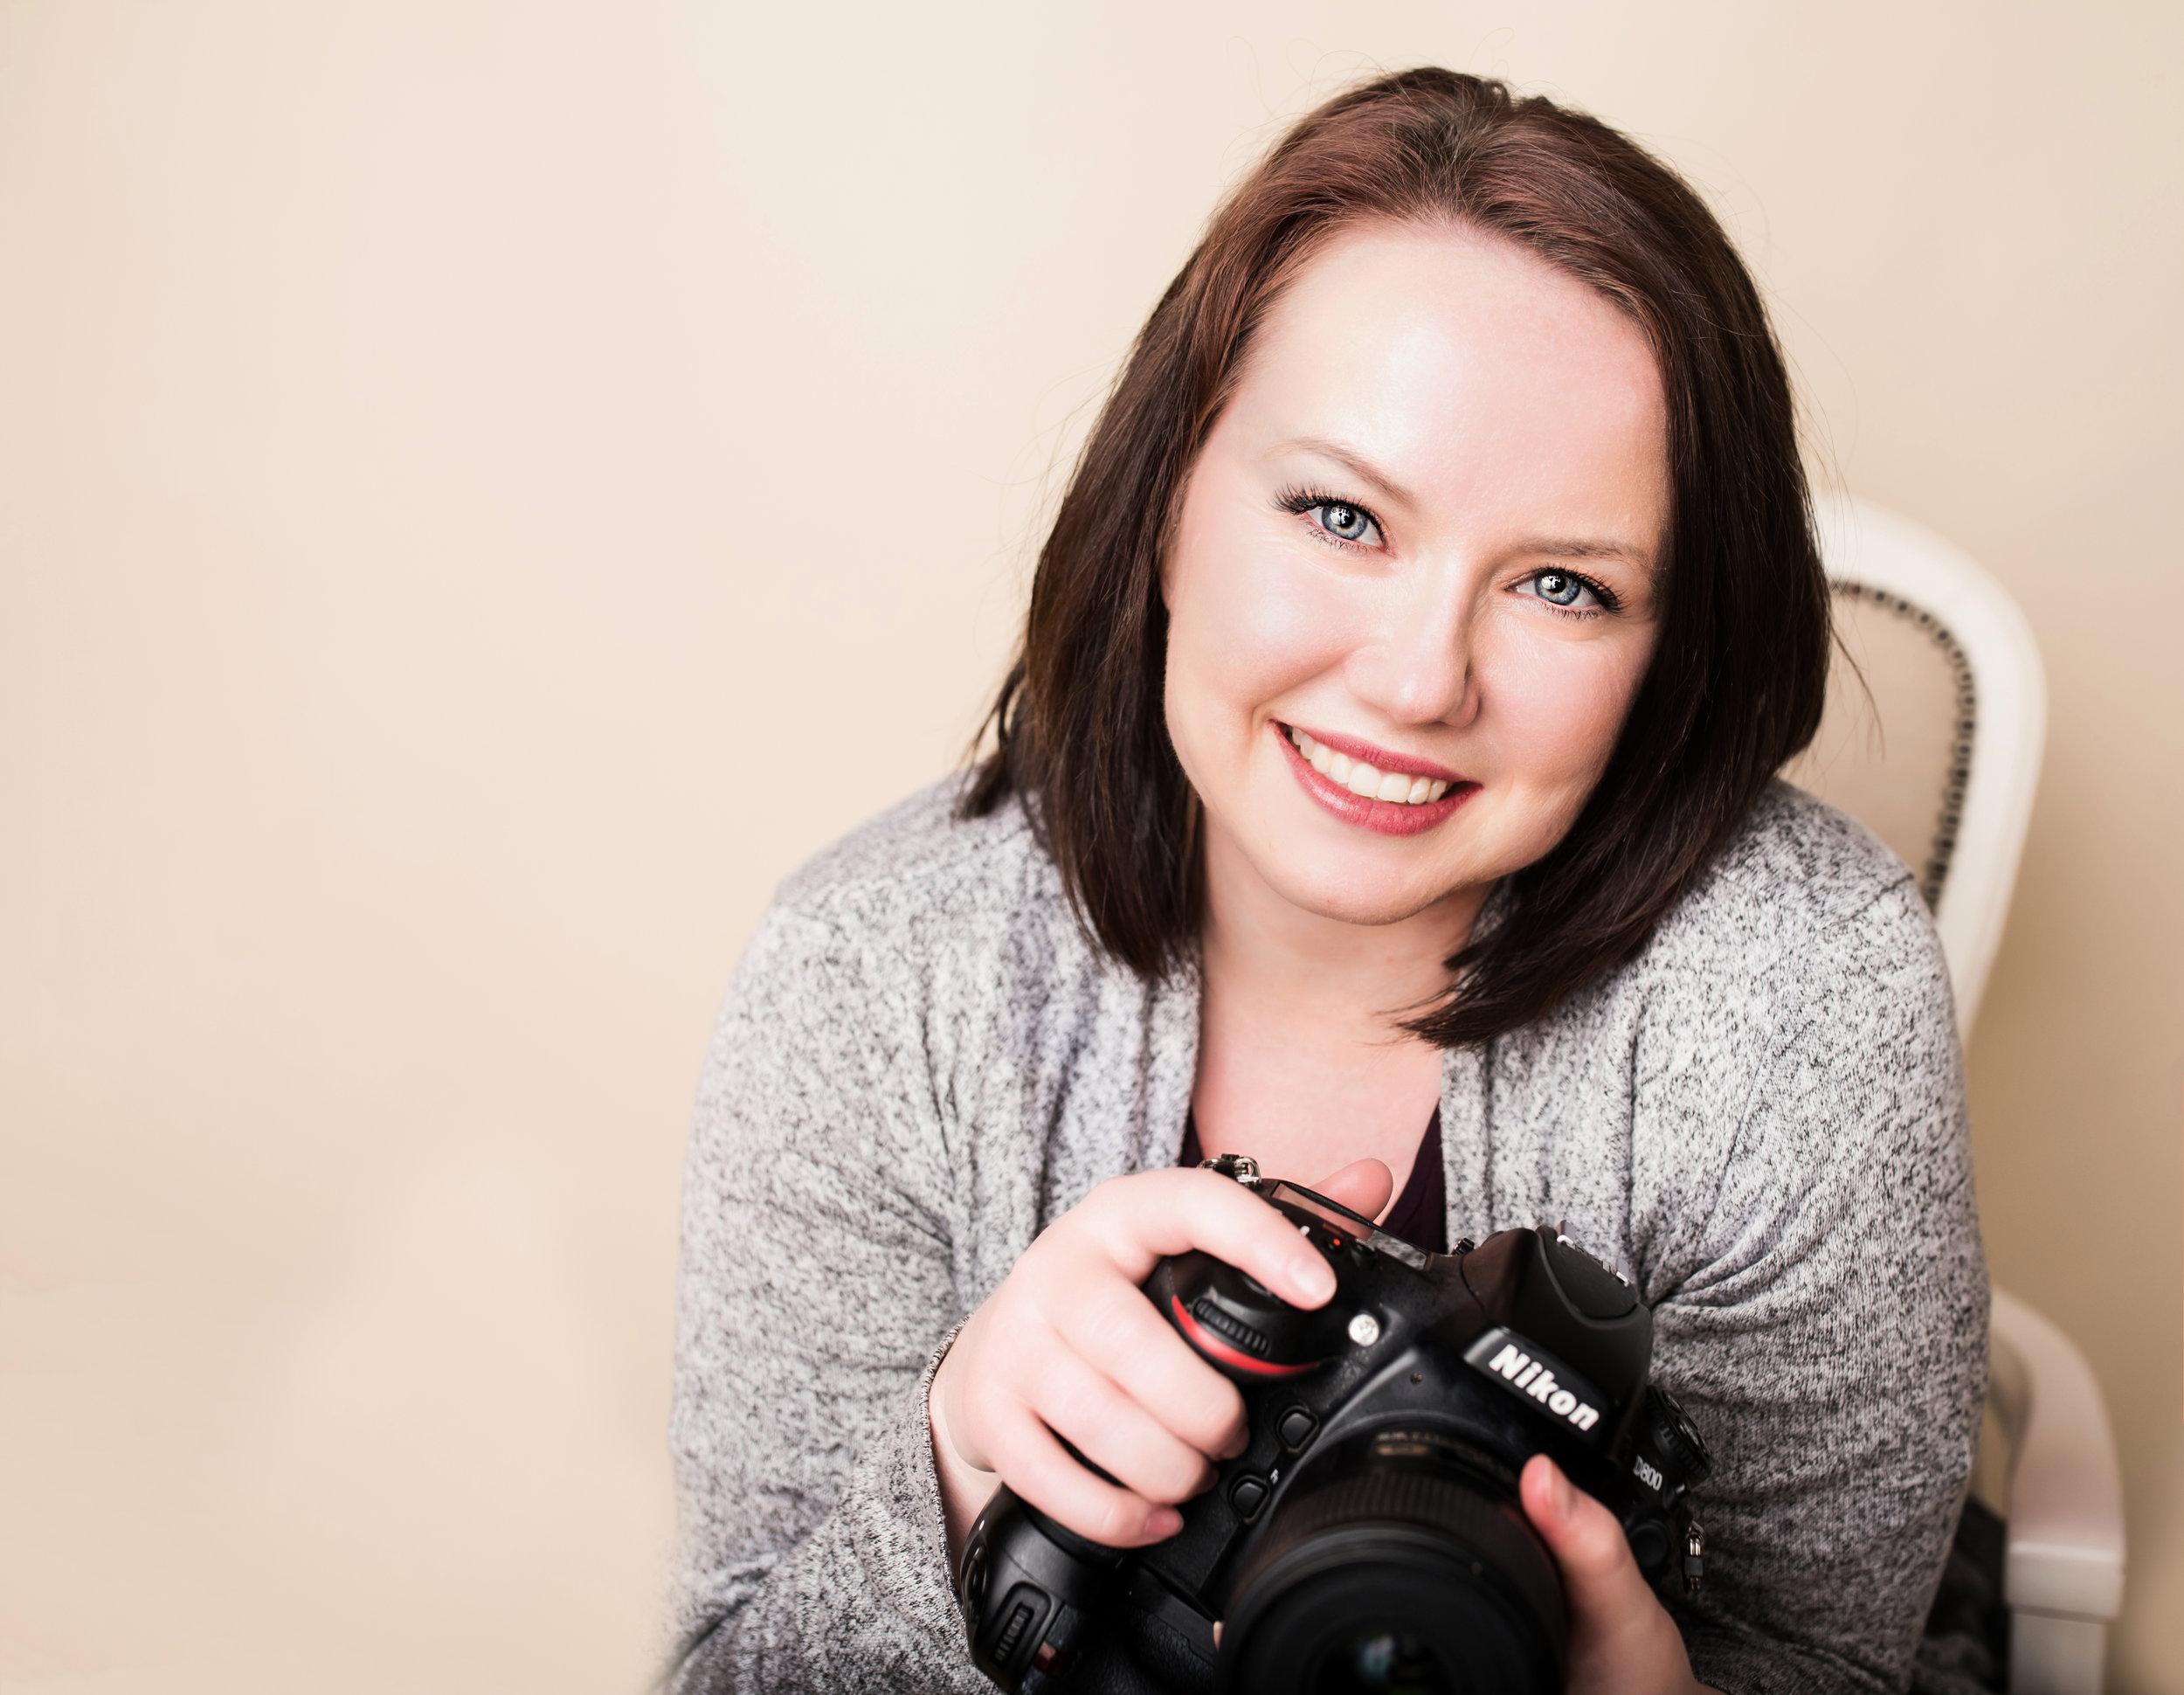 Ruxin John Photography WIsconsin Wedding Photographer